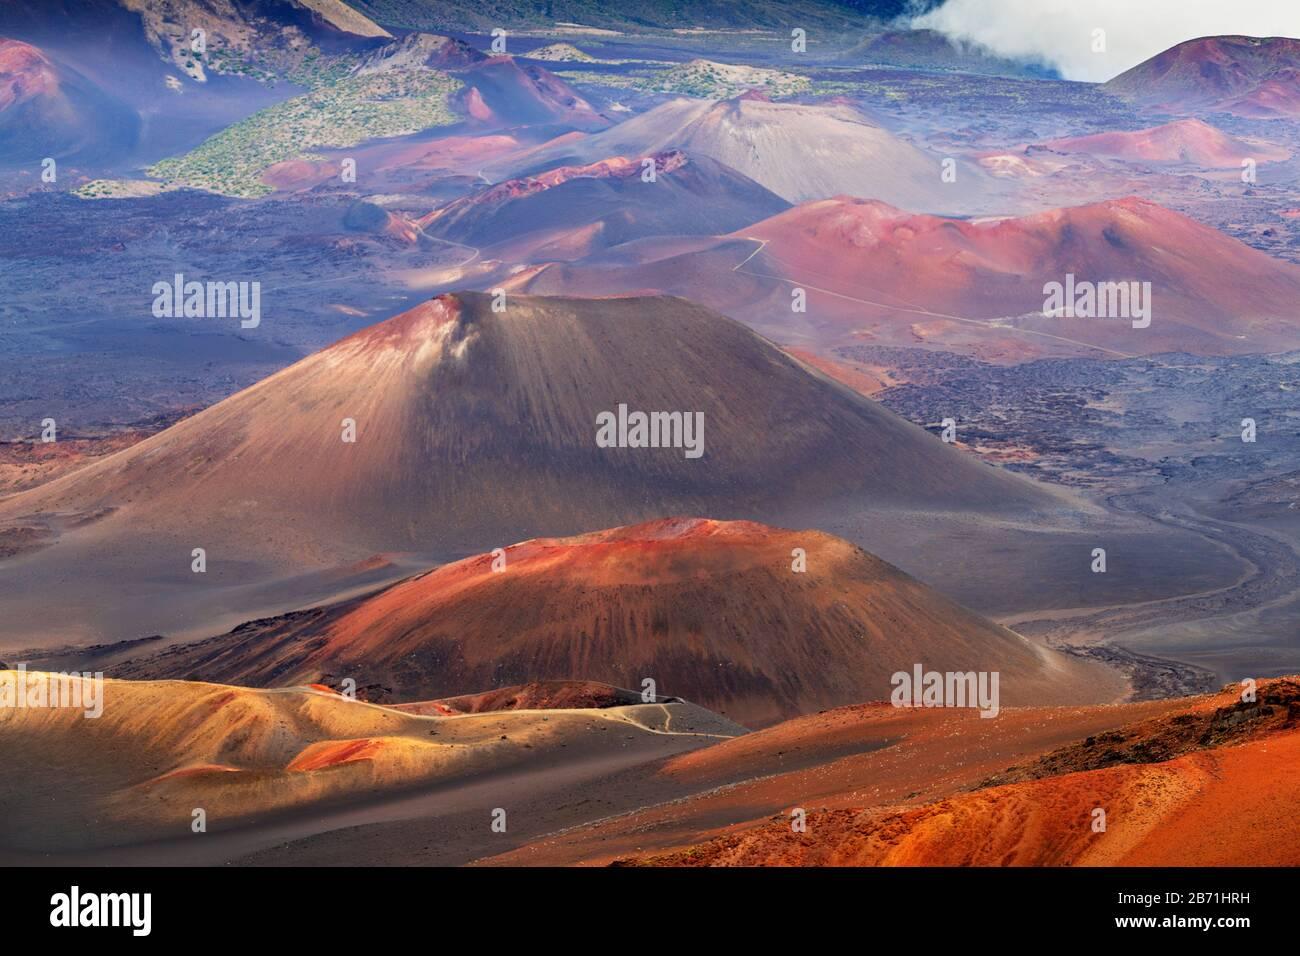 United States of America, Hawaii, Maui island, Haleakala National Park, volcanic landscape Stock Photo